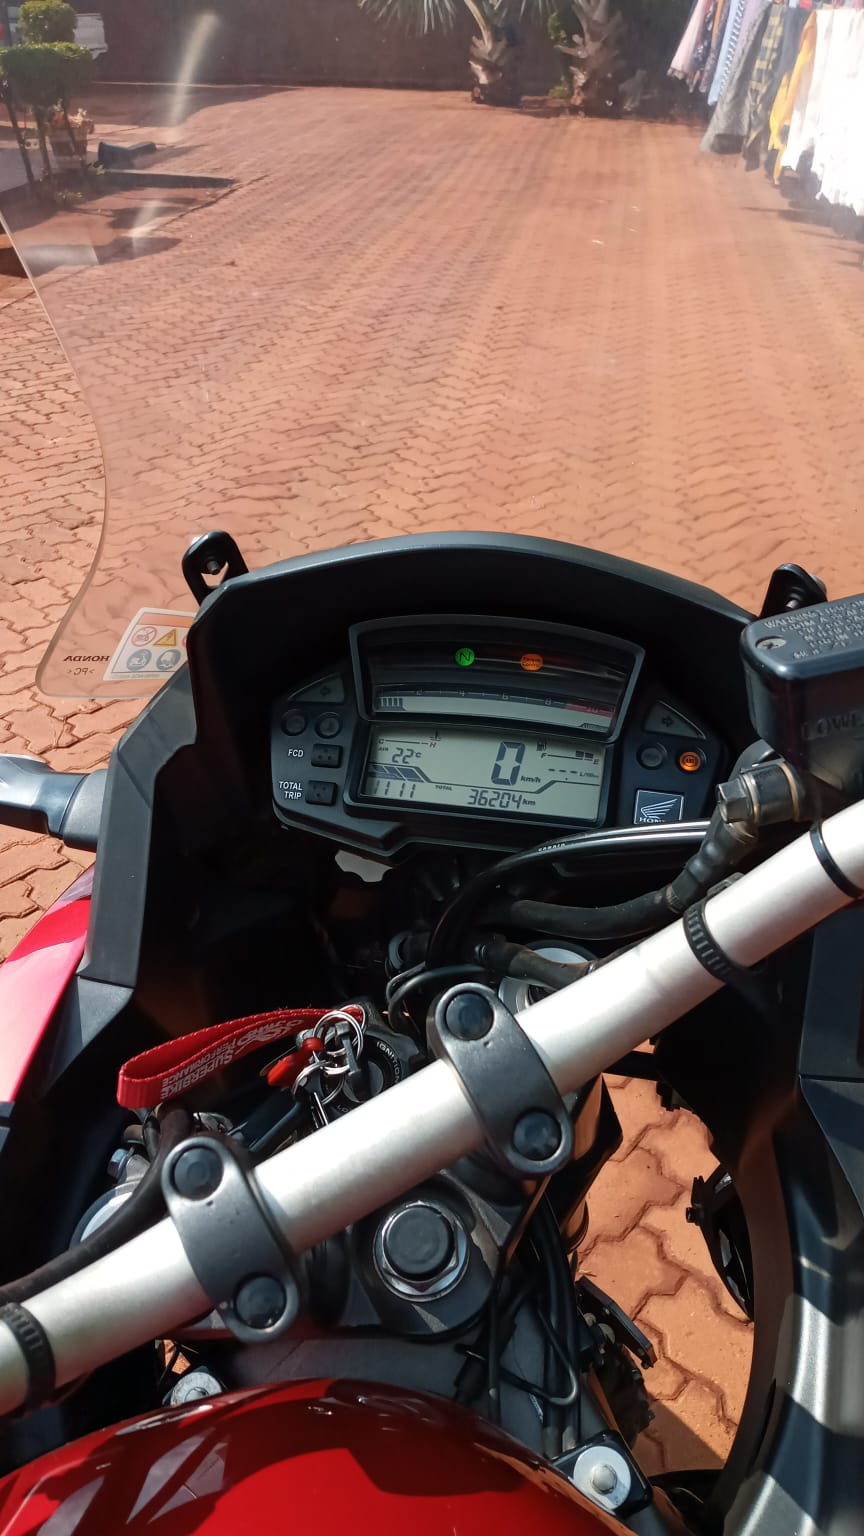 2015 Honda Tourer 1200 for sale